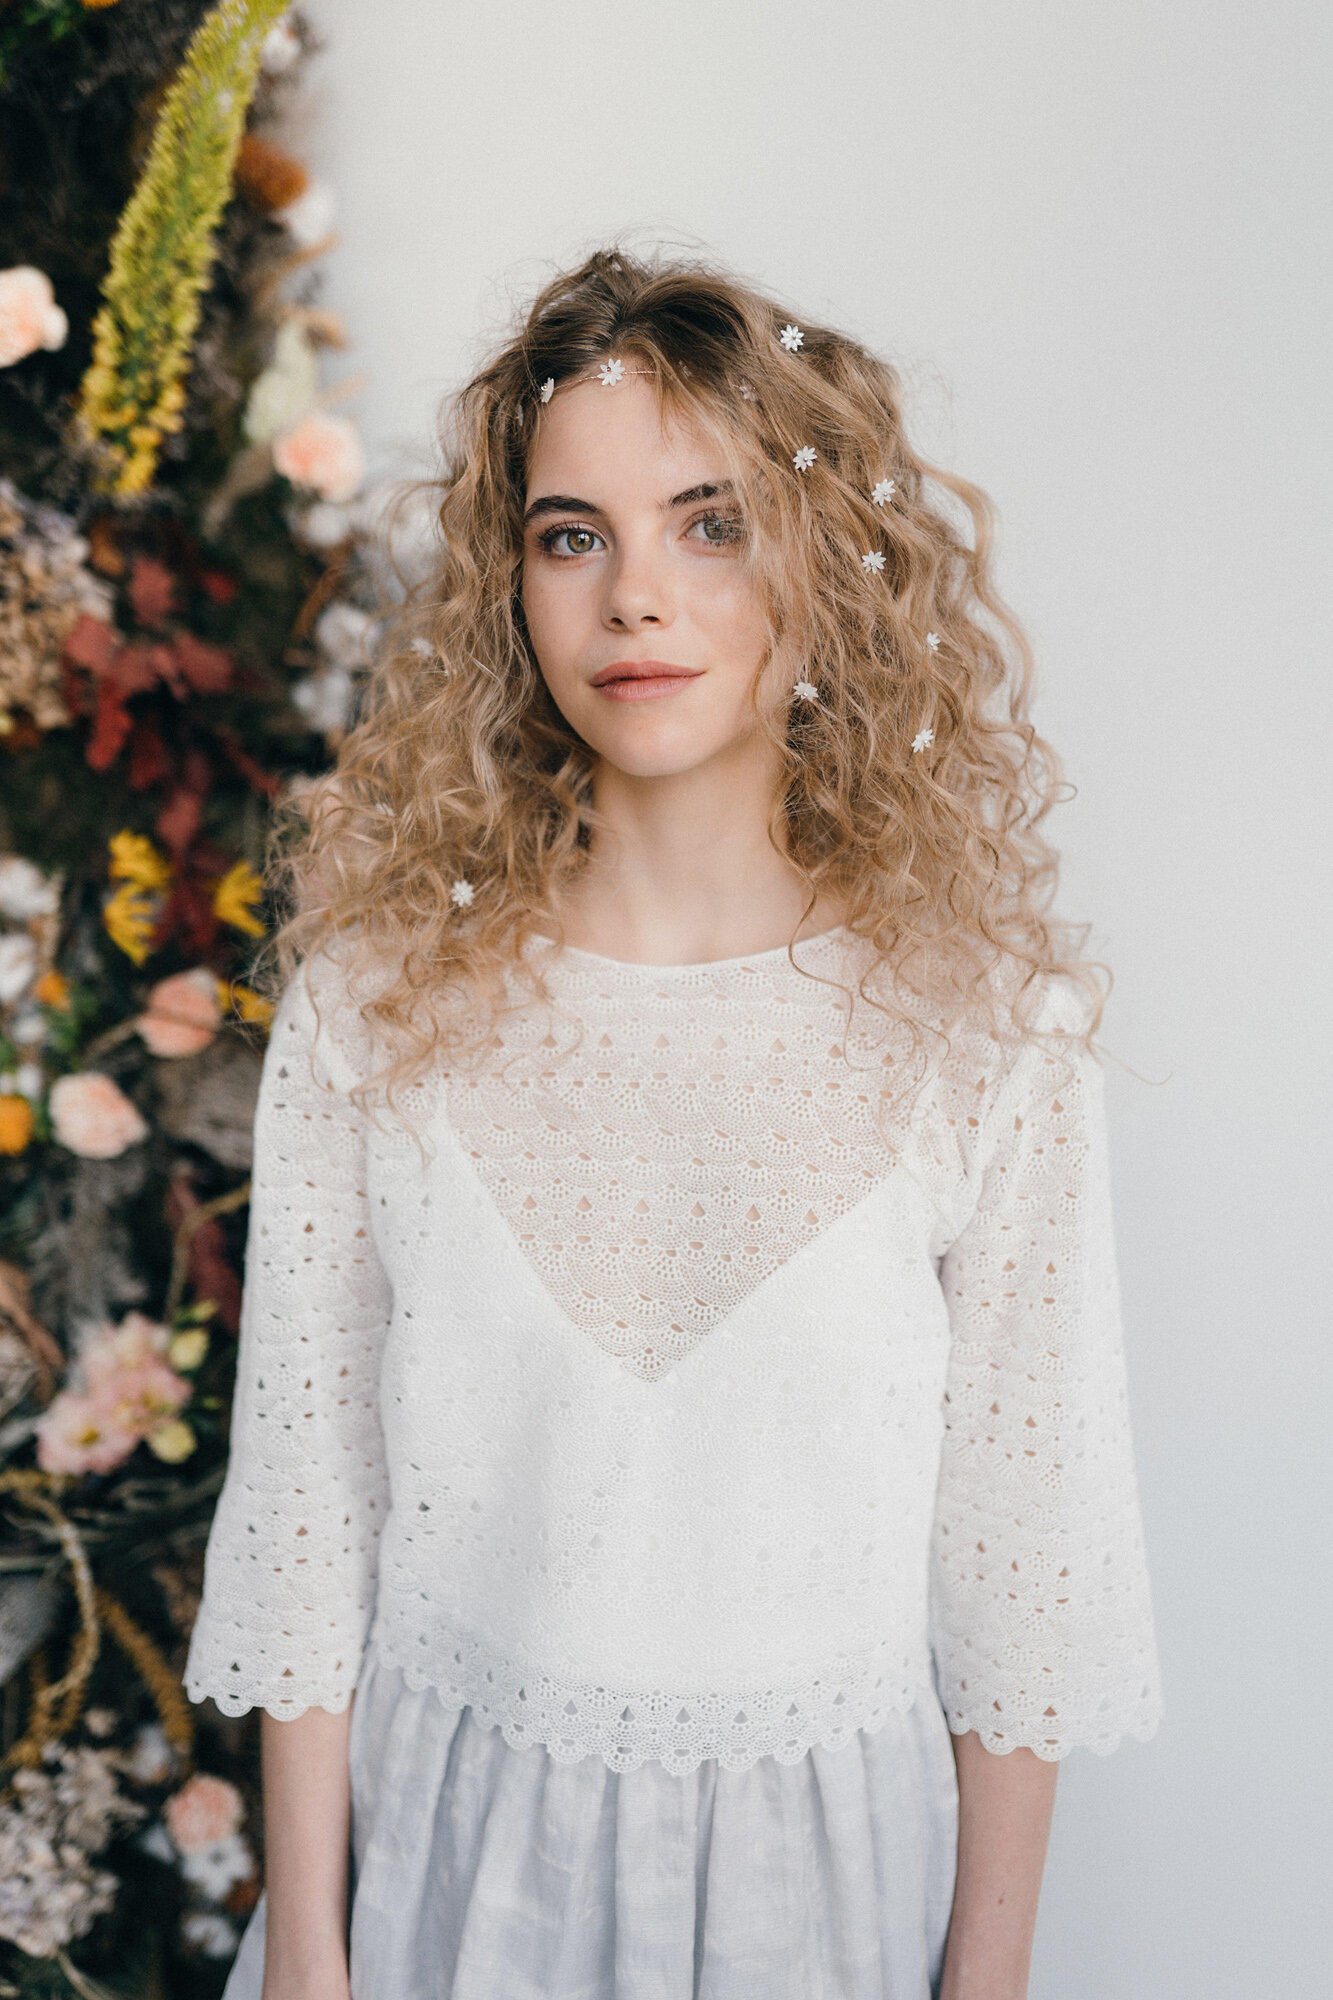 Debbie-Carlisle-Bridal-Accessories-Kate-Beaumont-Wedding-Gowns-Sheffield-Yorkshire-UK-41.jpg